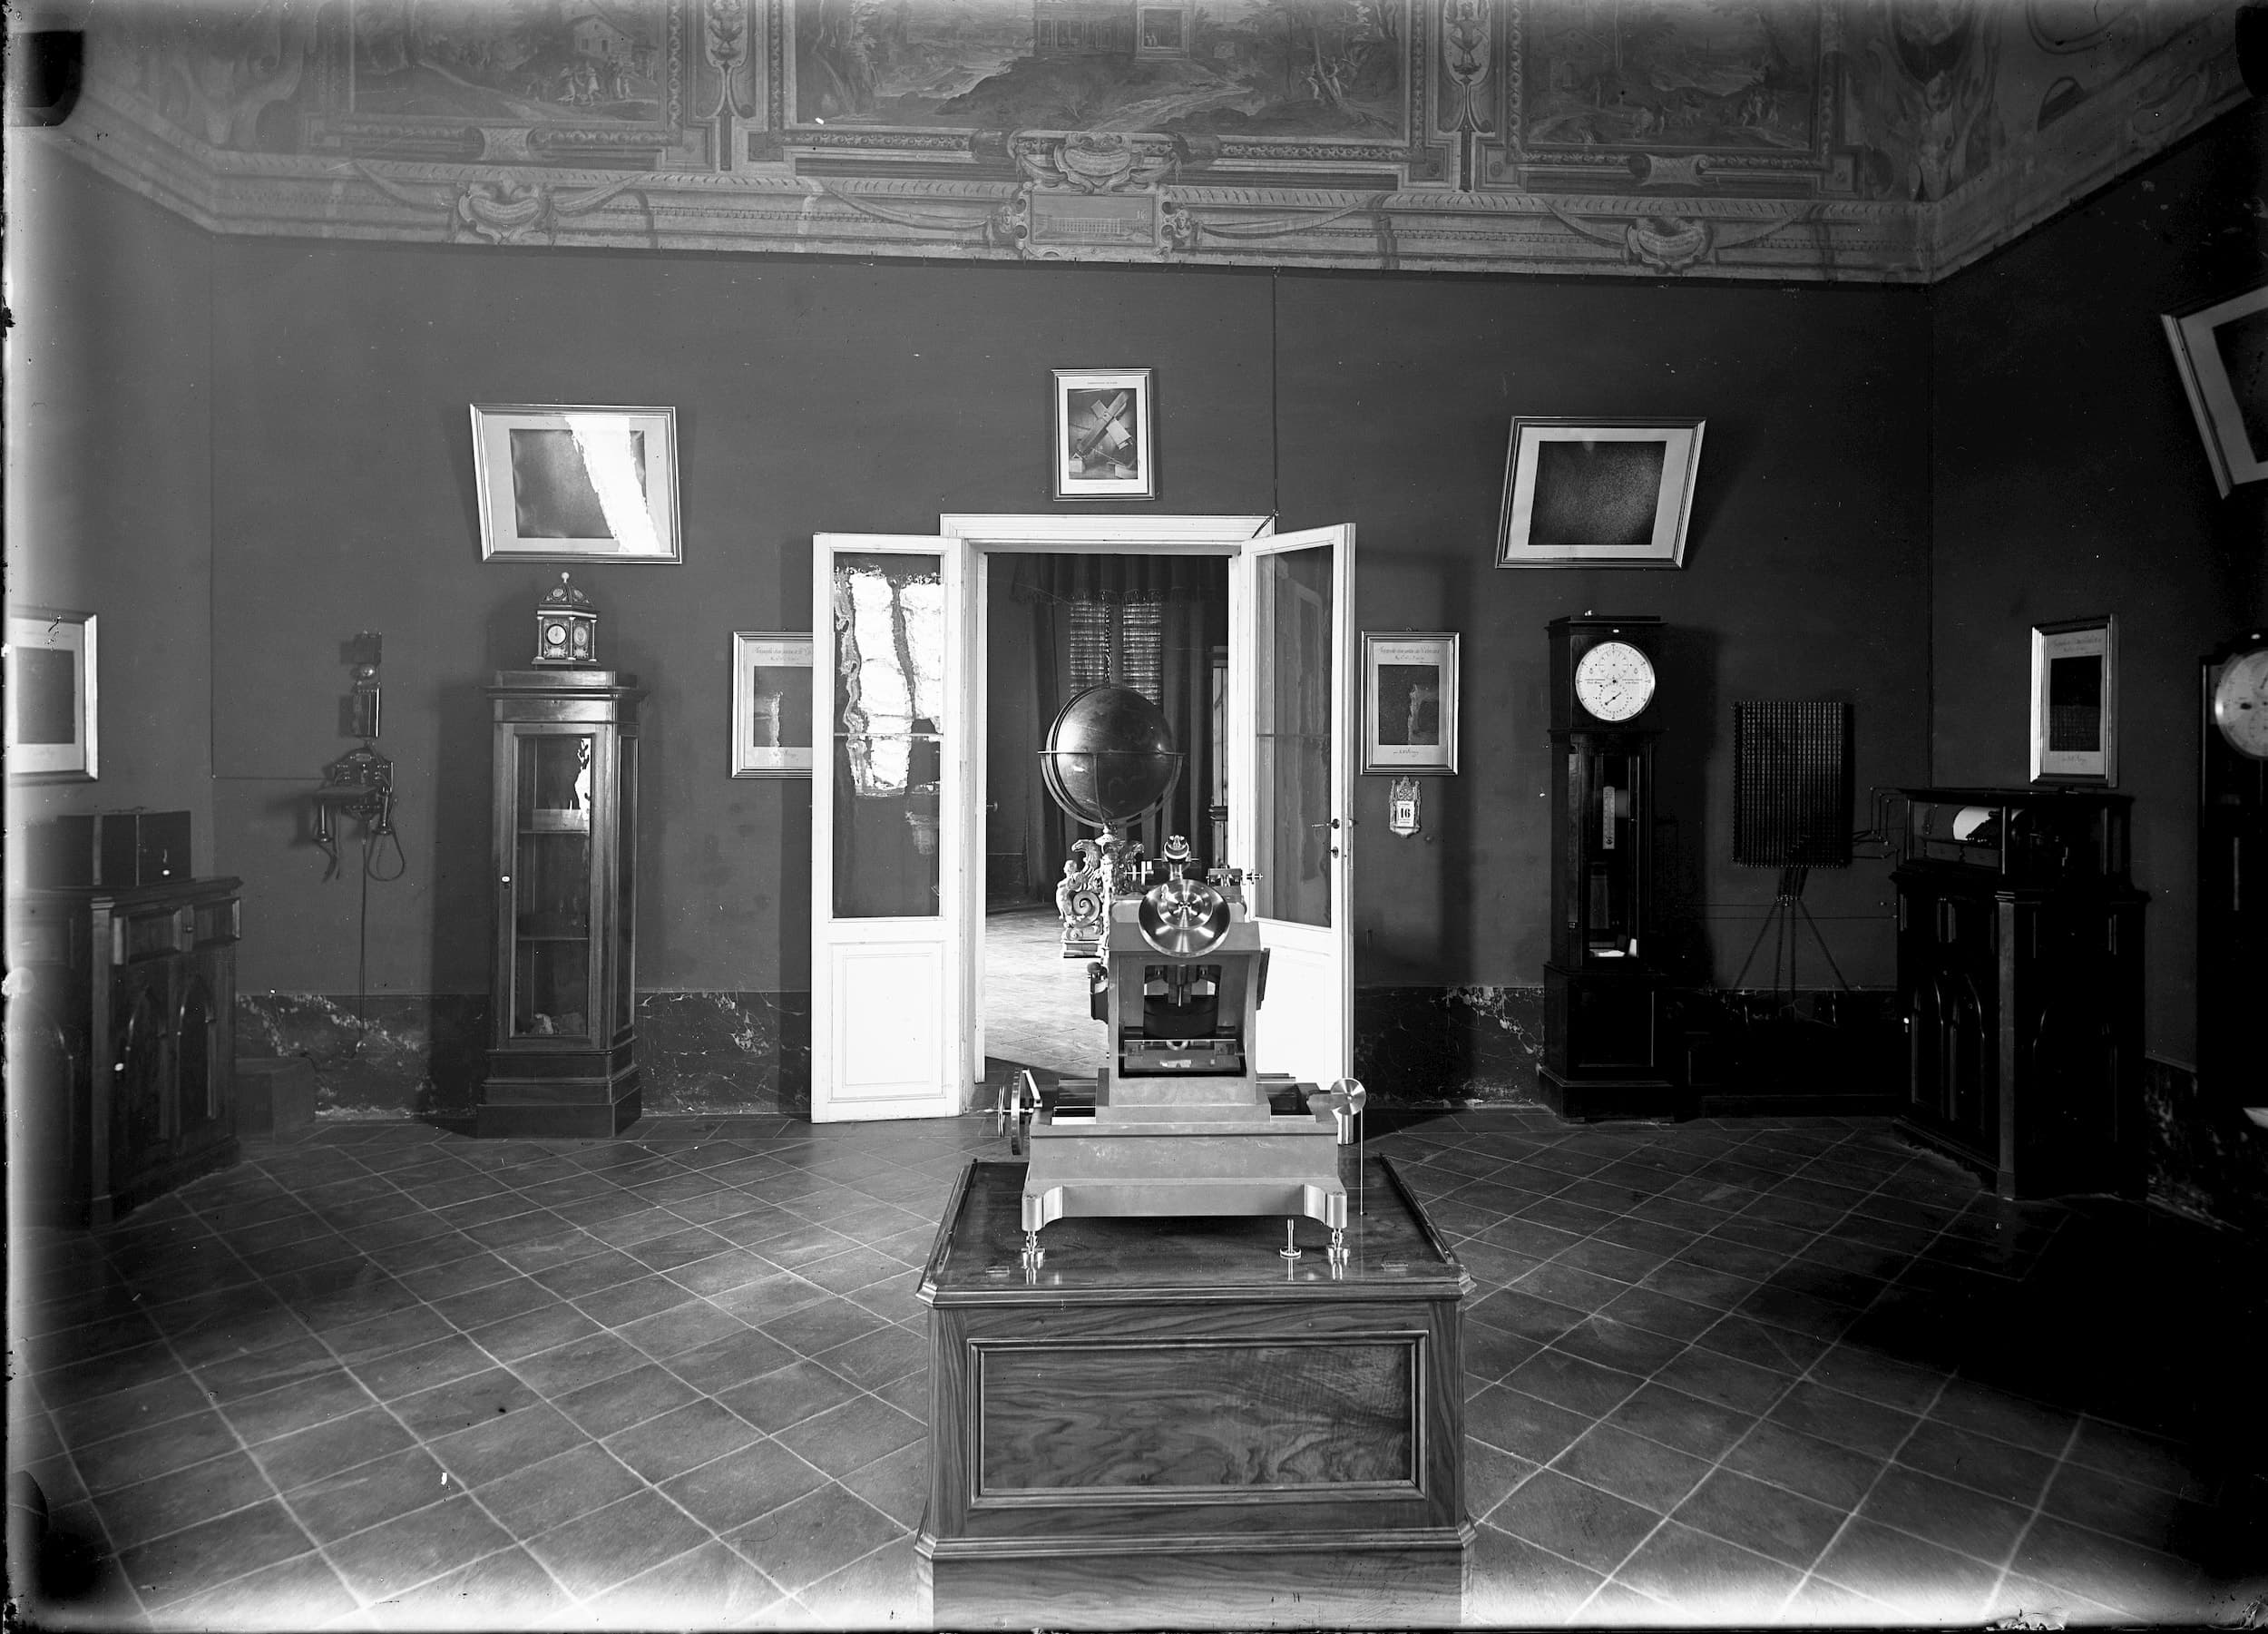 Display of meteorological instruments, circa 1900; 2